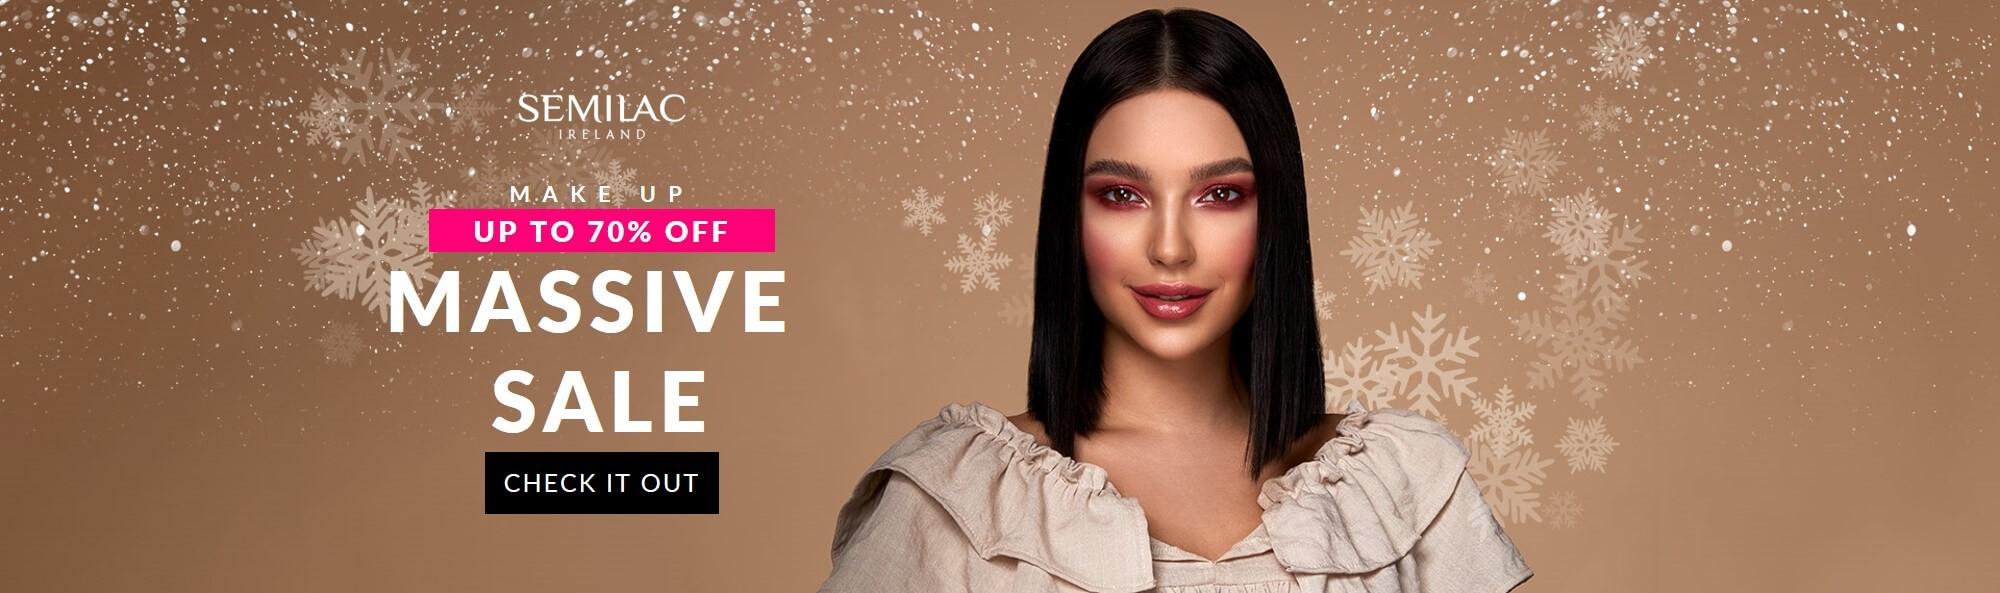 Semilac Makeup SALE